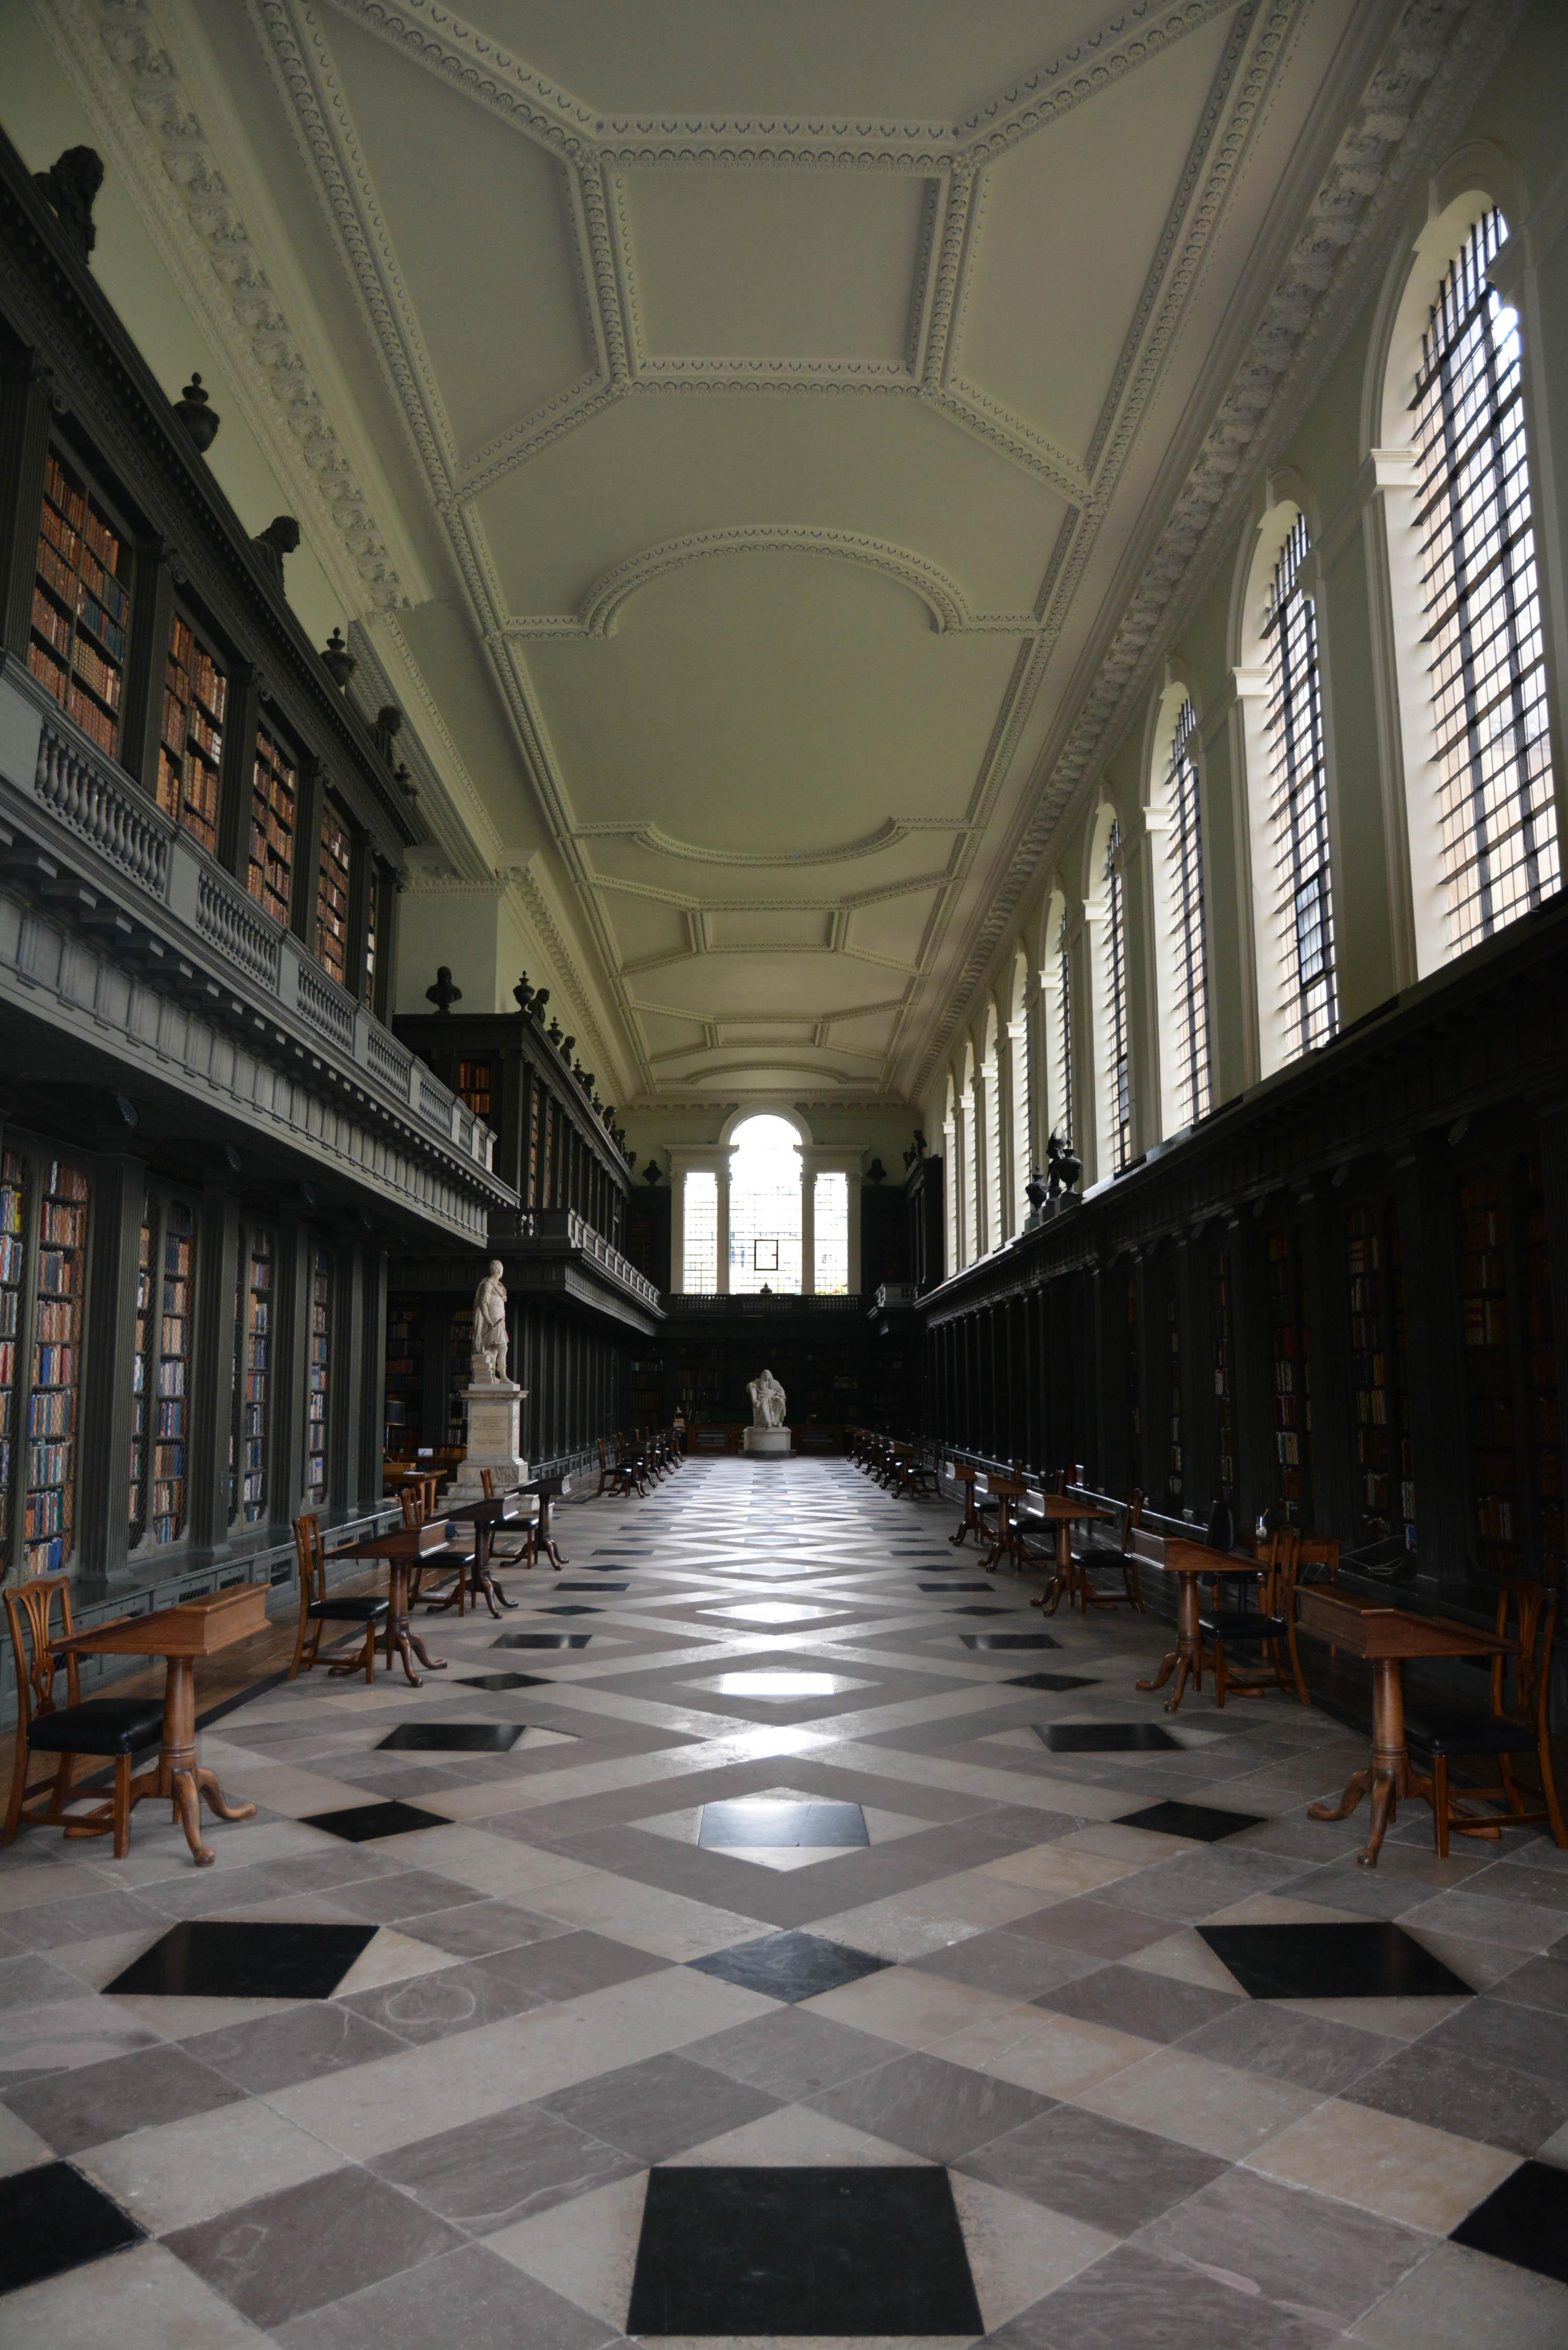 Codrington Library - Internal facing East